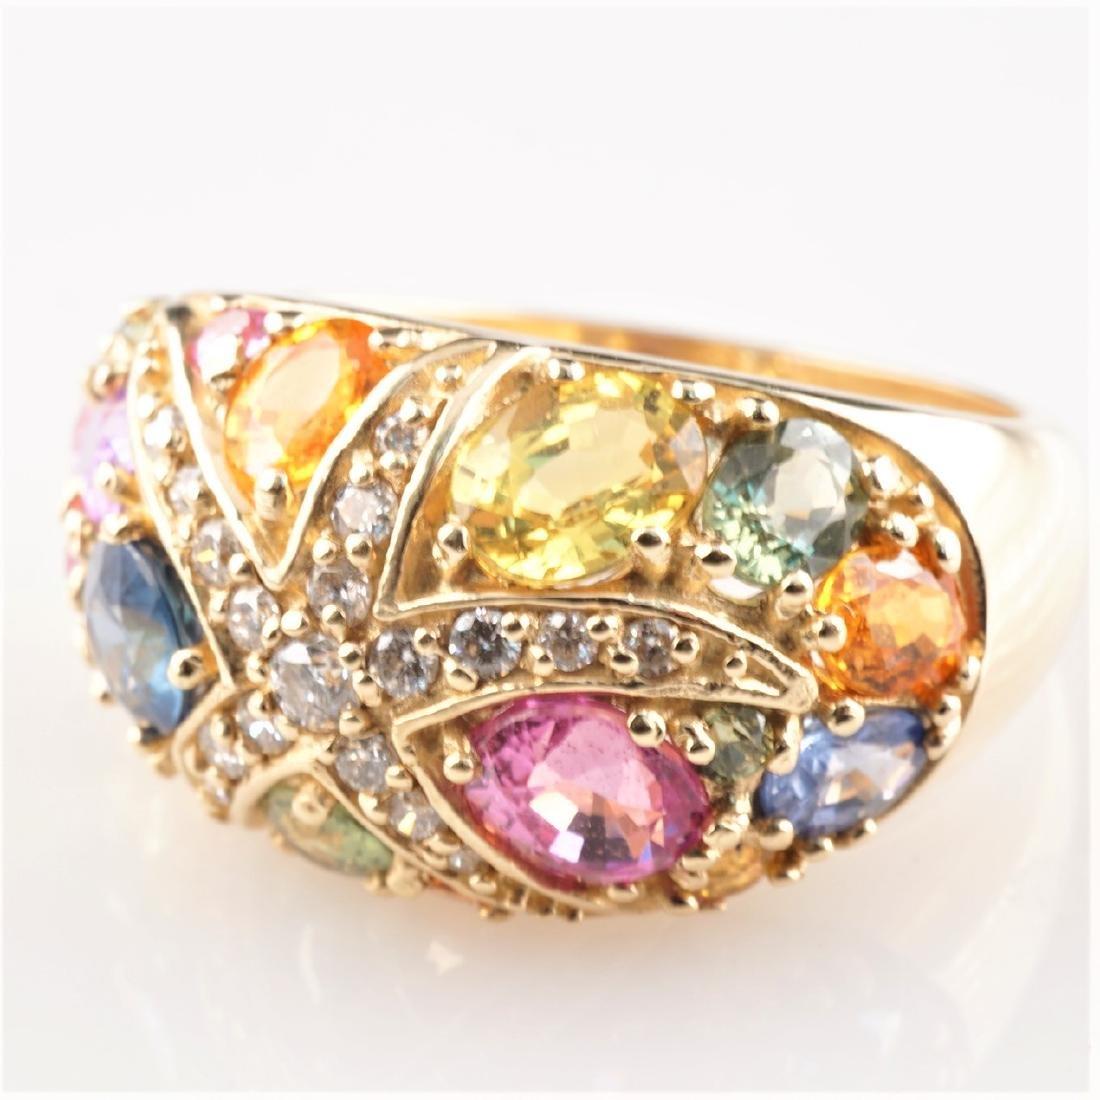 Starfish Diamond & Multistone Ring sz 7 in 14k